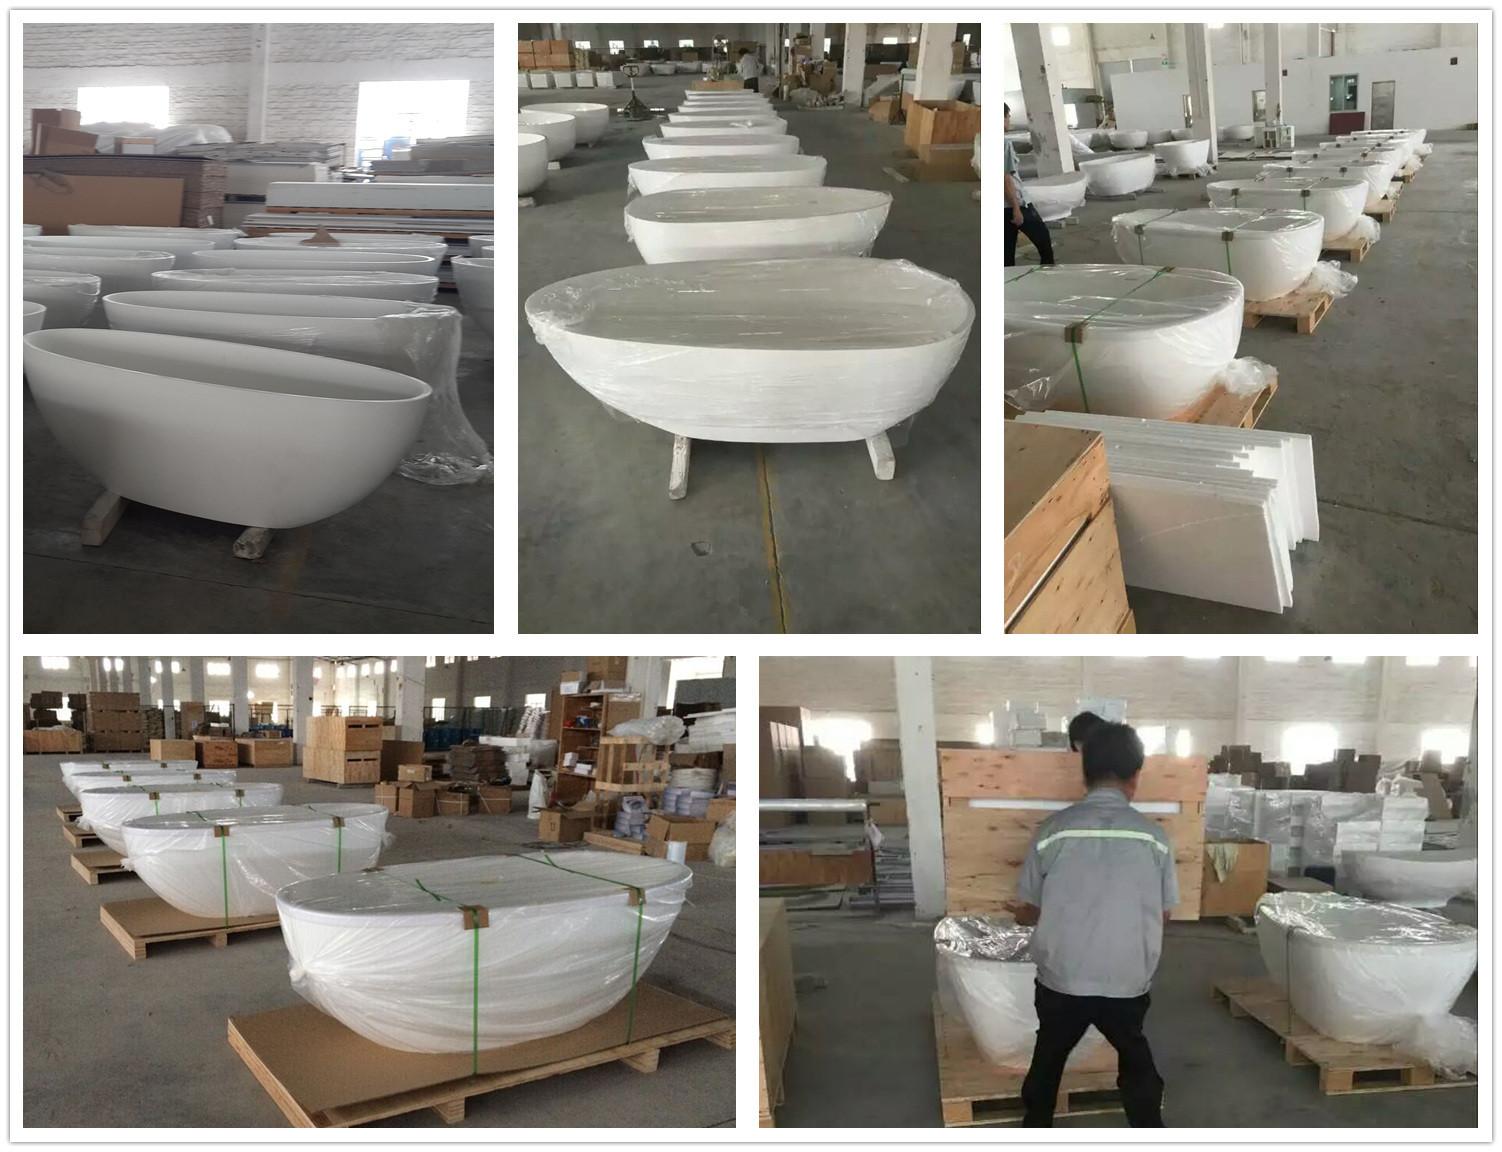 Bellissimo-Composite Stone Unique Arc Freestanding Solid Surface Bathroom-9